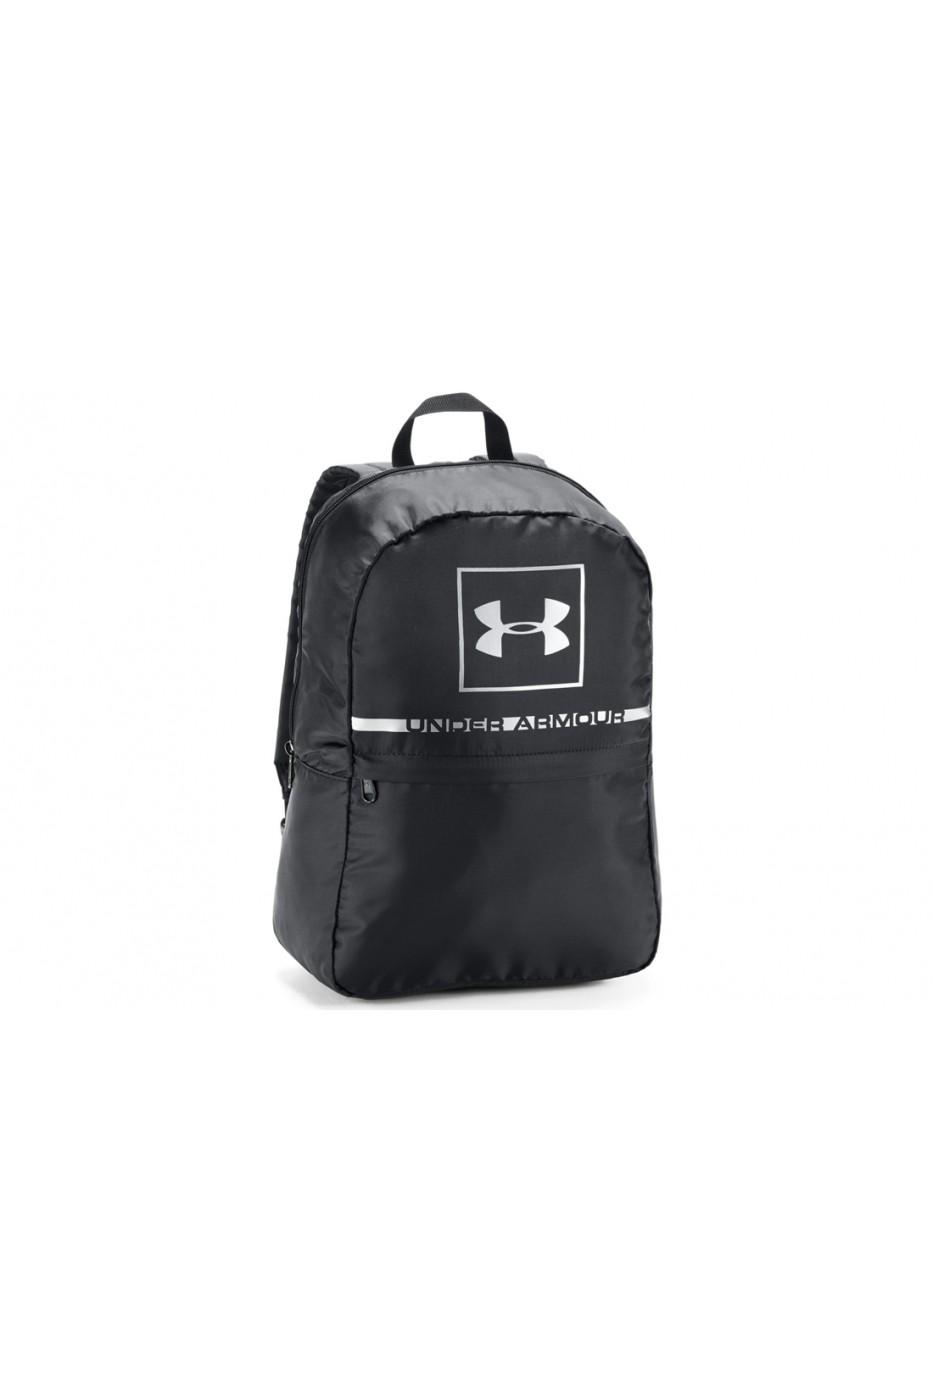 Rucsac pentru barbati Under Armour UA Project 5 Backpack 1324024-003 59d3a576cd